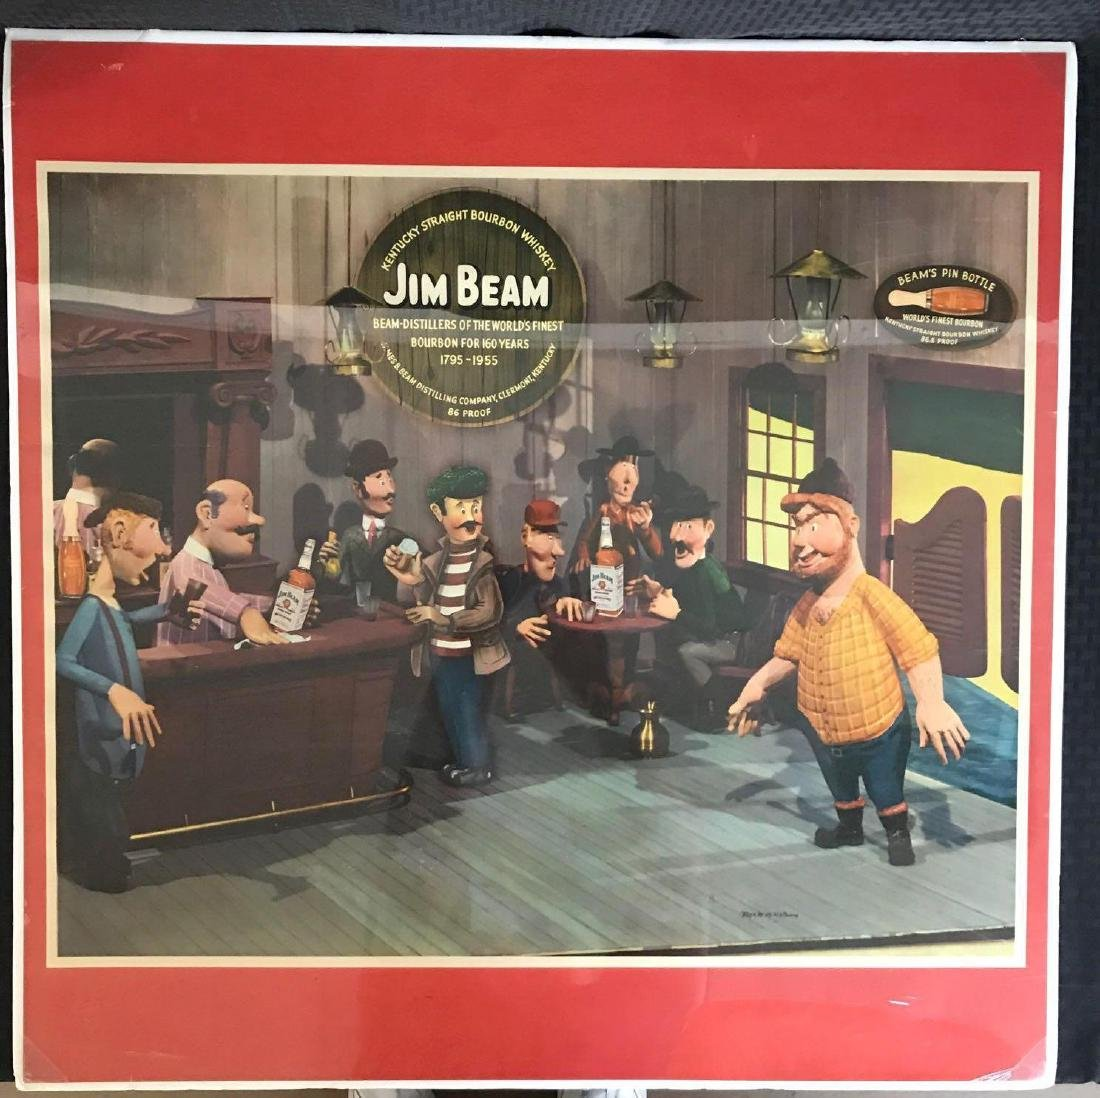 Large Jim Beam Poster by Rex Werner